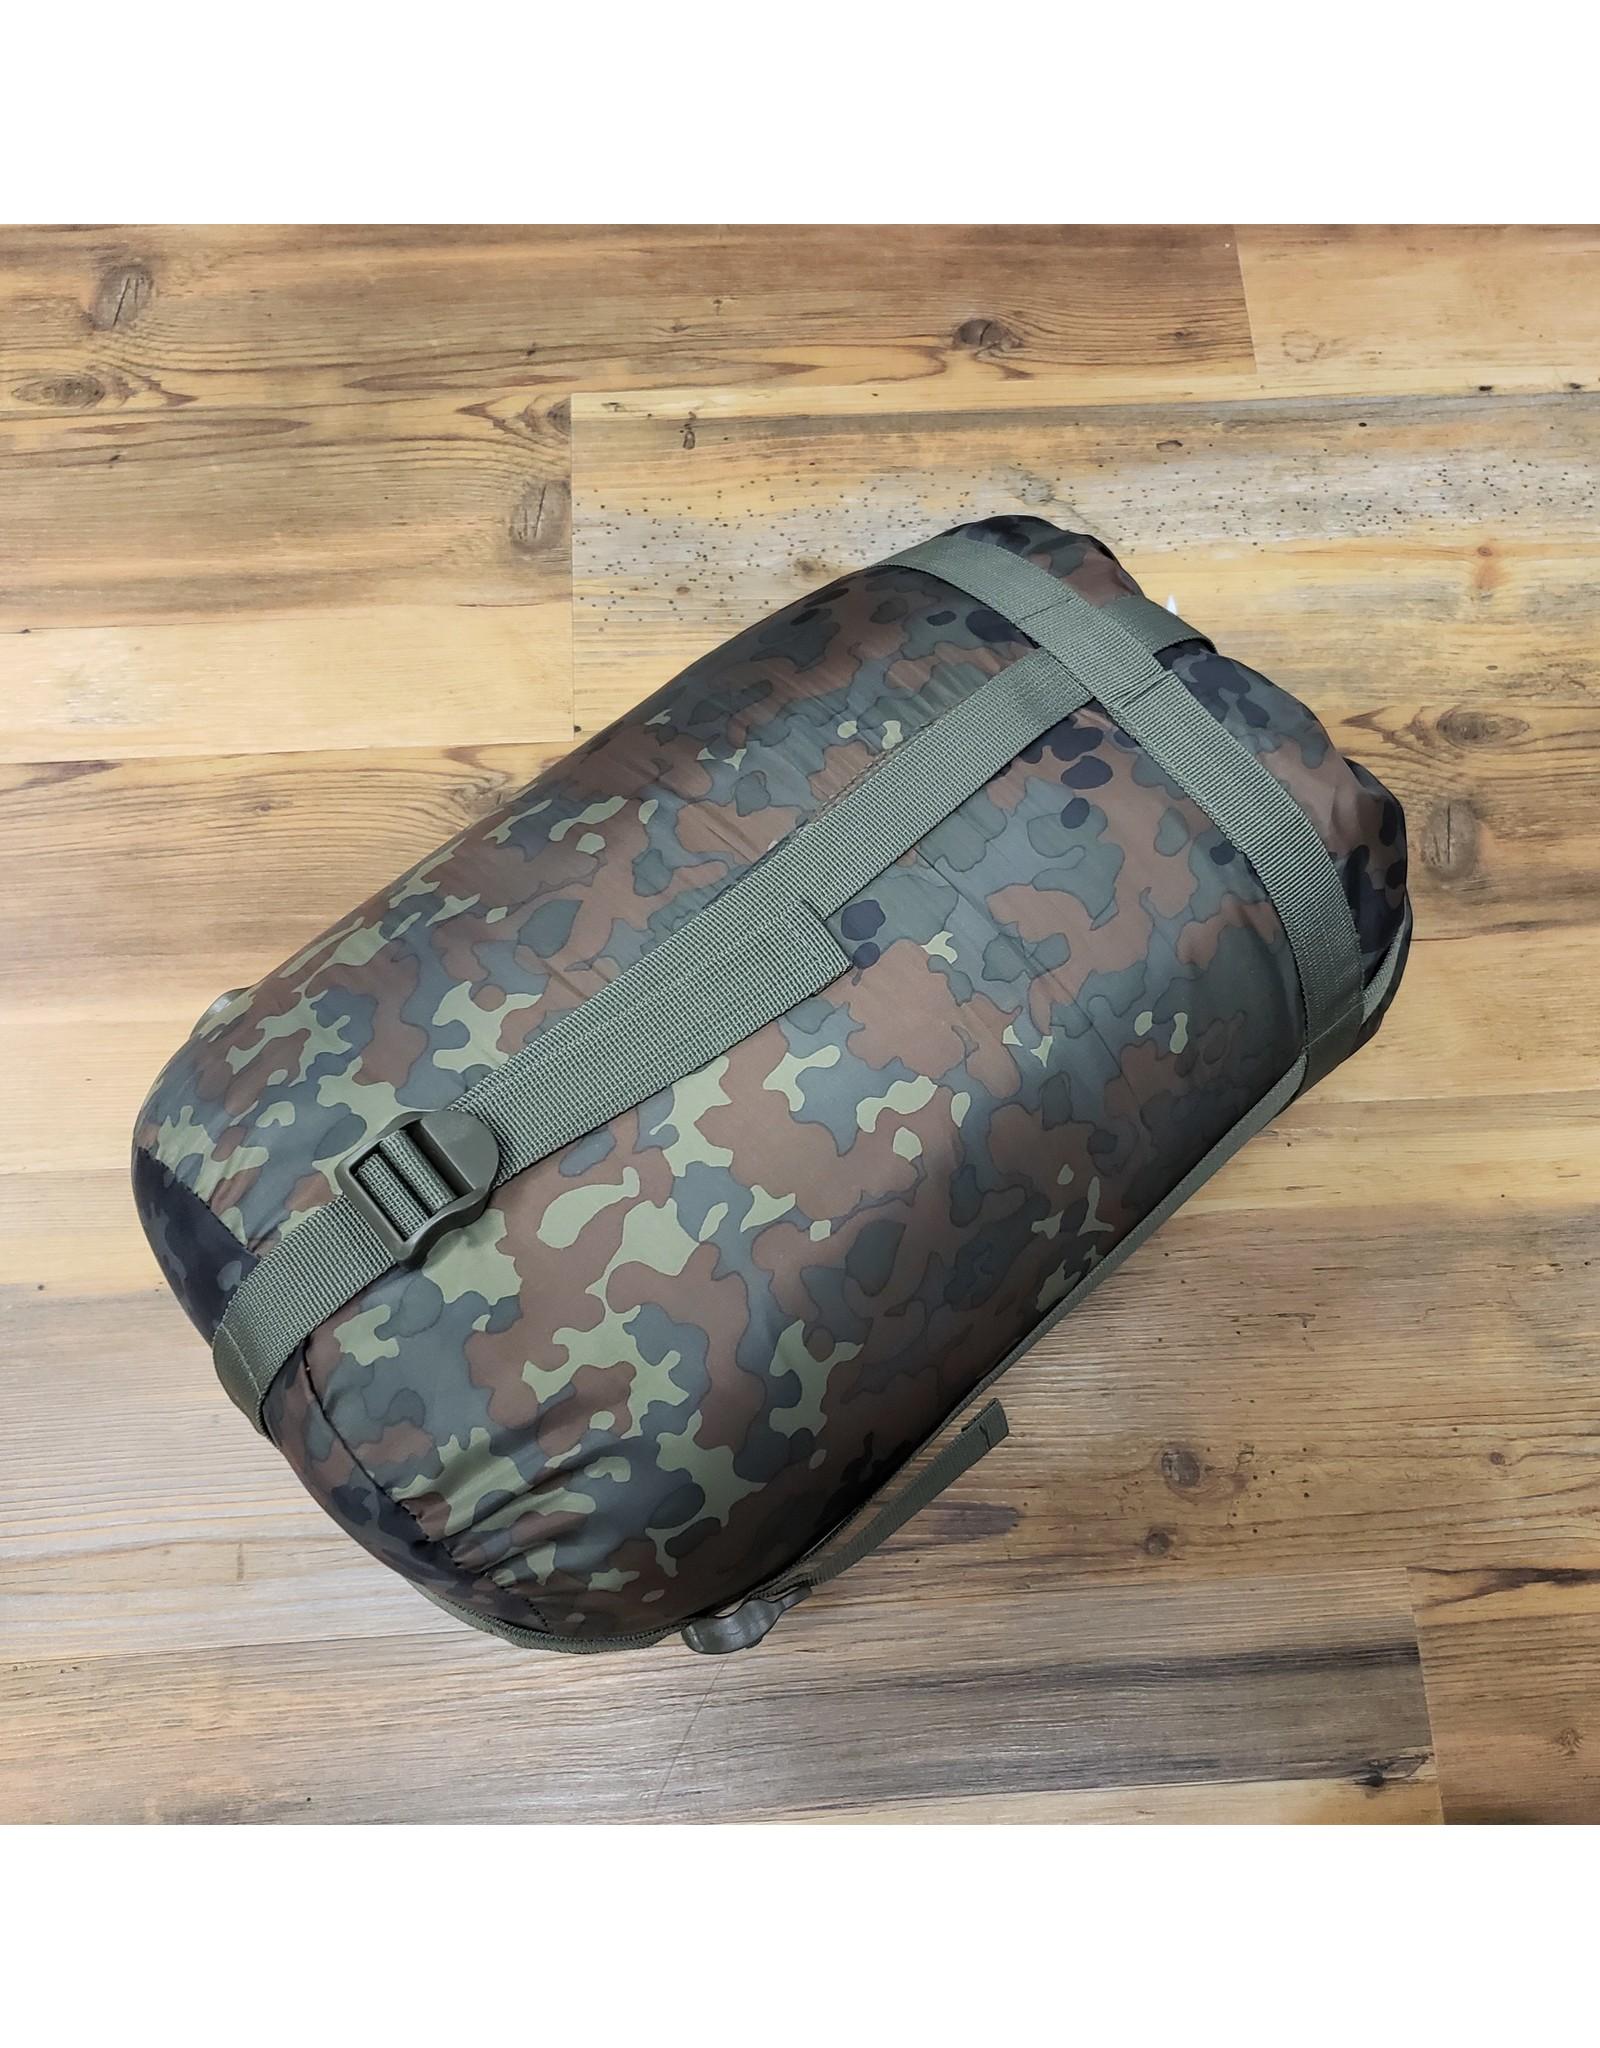 STURM MILSPEC MIL-TEC FLECTAR CAMO 400G MUMMY SLEEP BAG  NEW